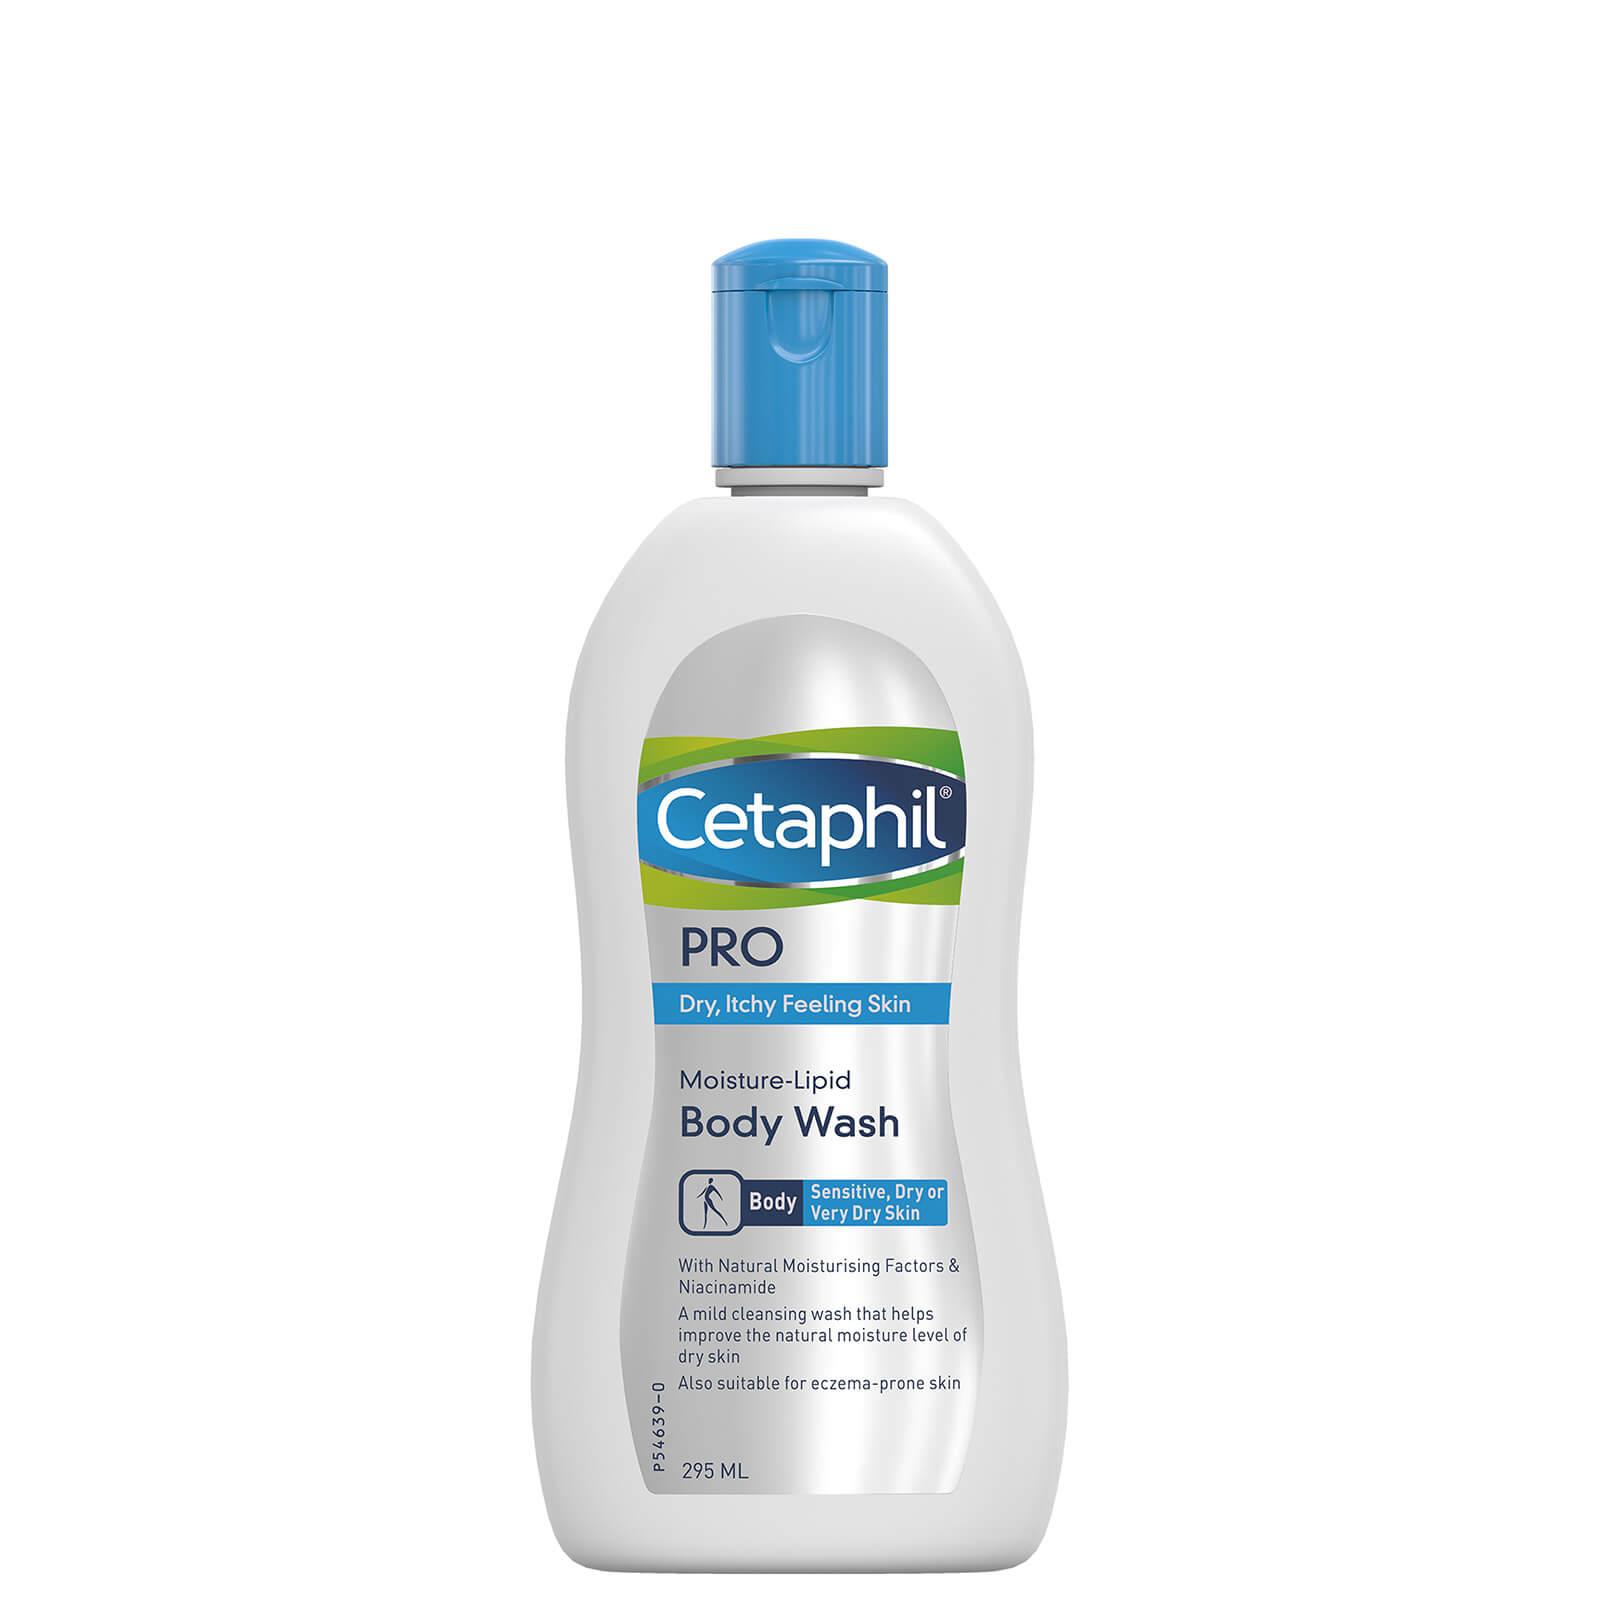 Купить Cetaphil PRO Moisture-Lipid Body Wash 250ml